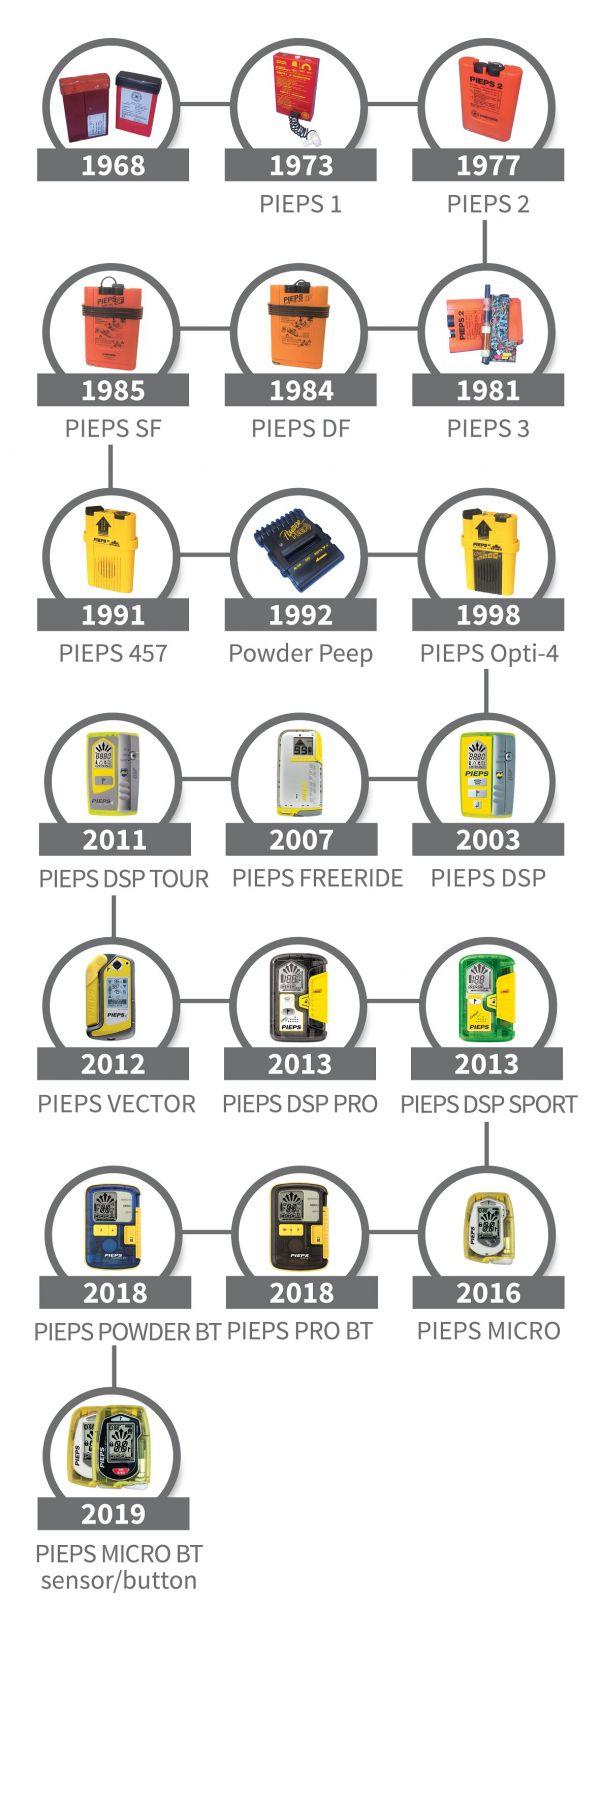 Pieps history